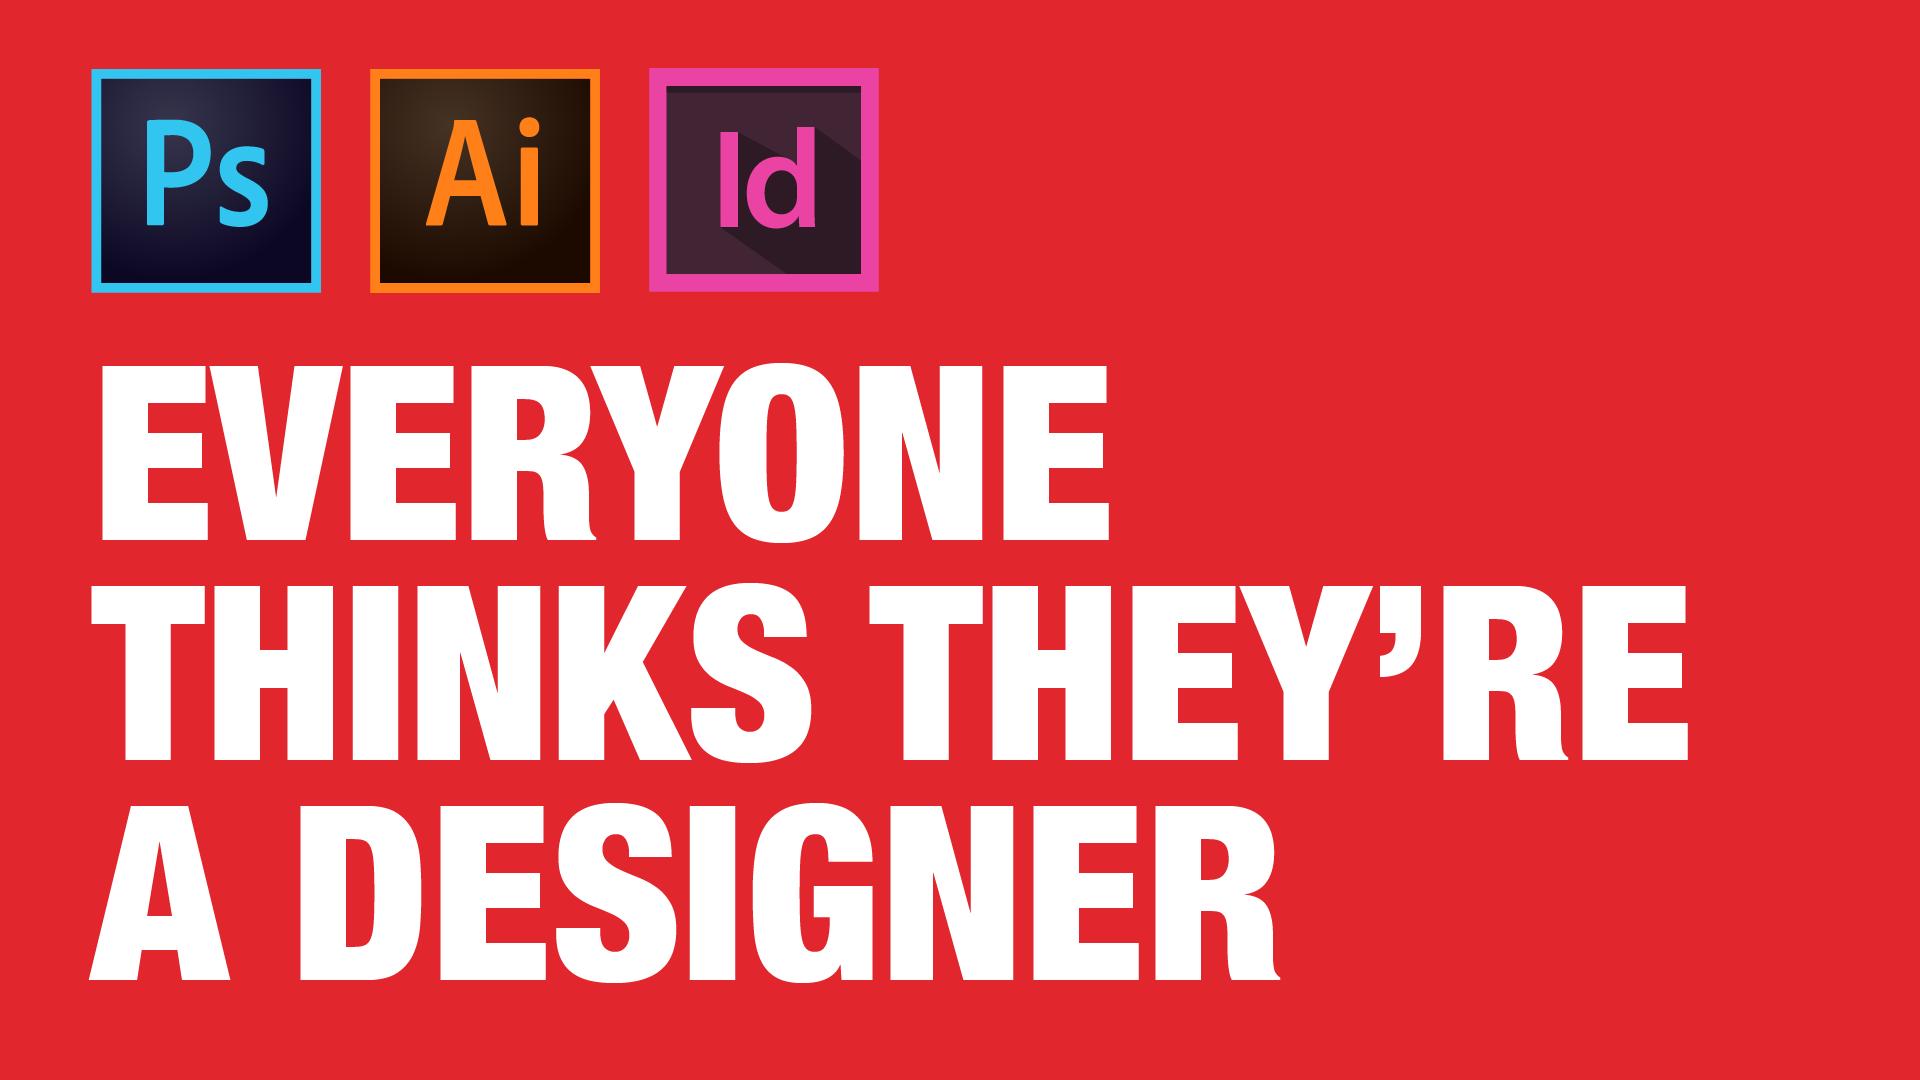 Manraj Ubhi - Everyone thinks they're a designer